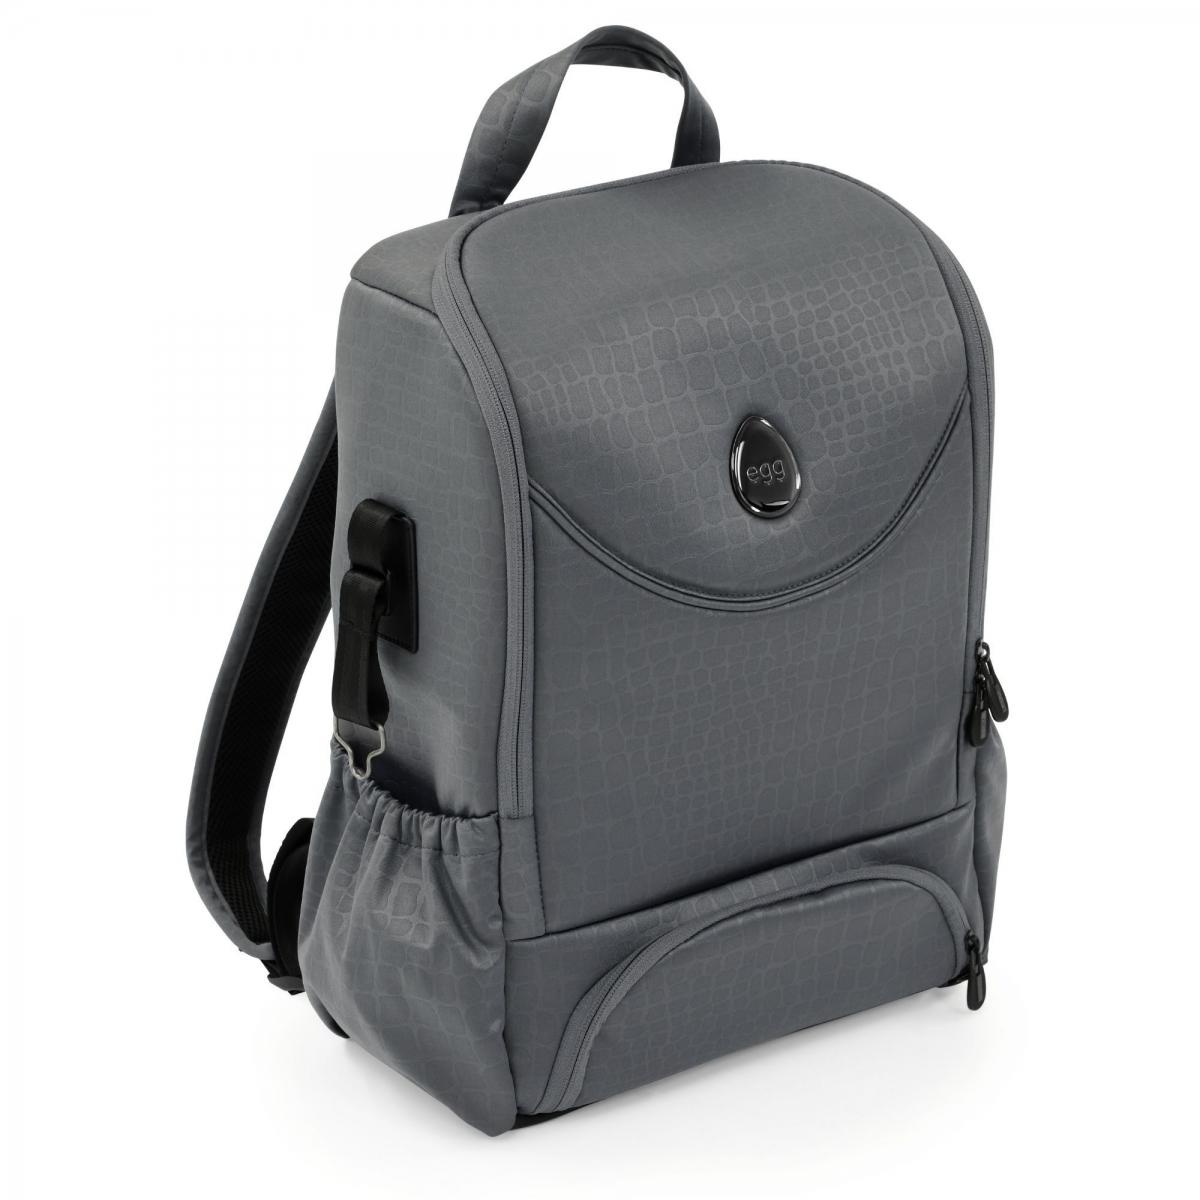 egg® 2 Backpack-Jurassic Grey (NEW)